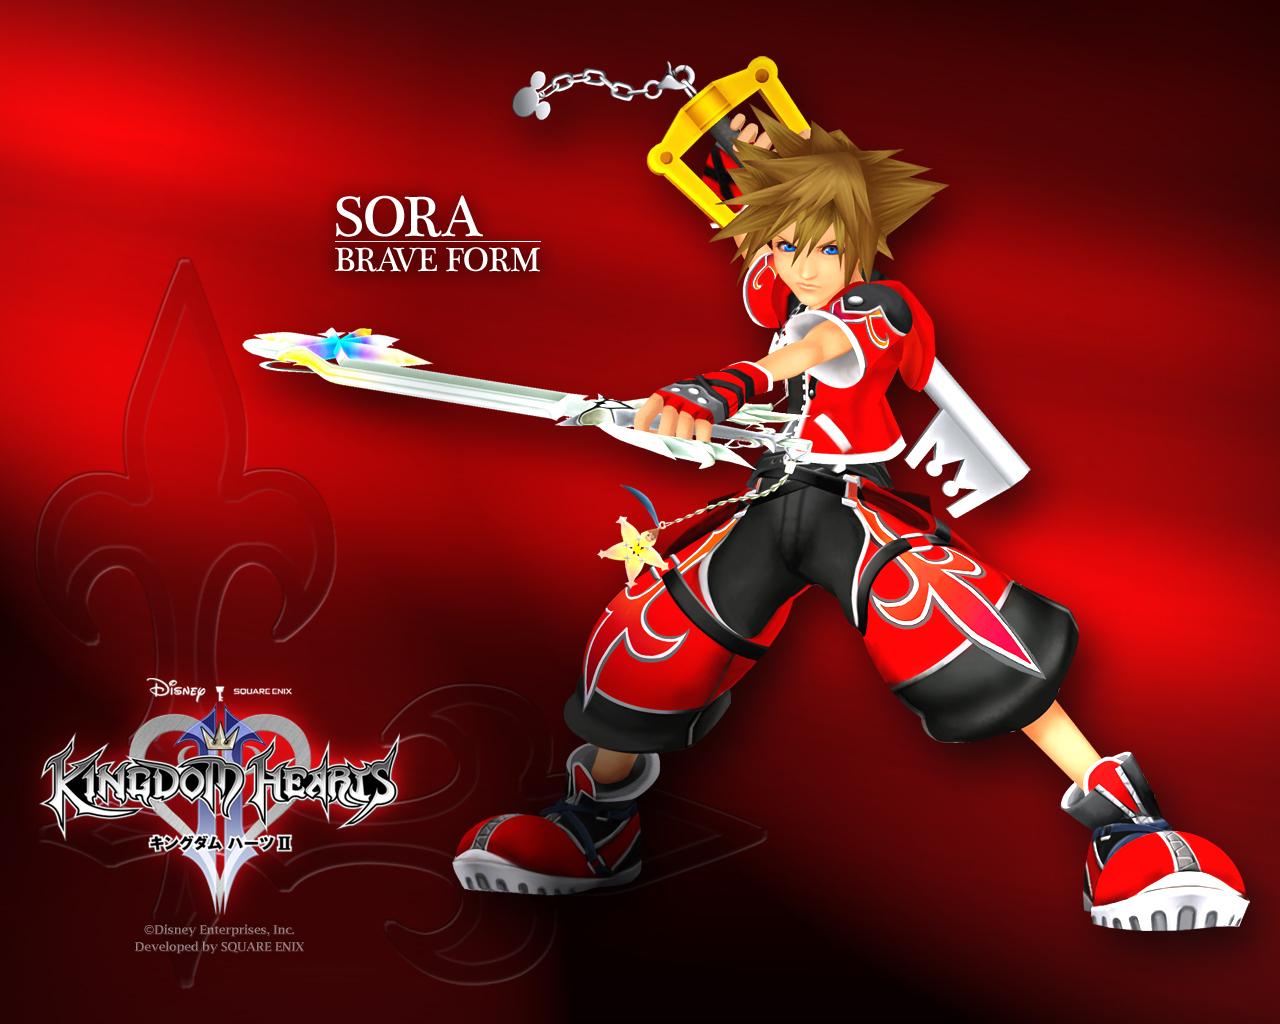 Sora's Forms